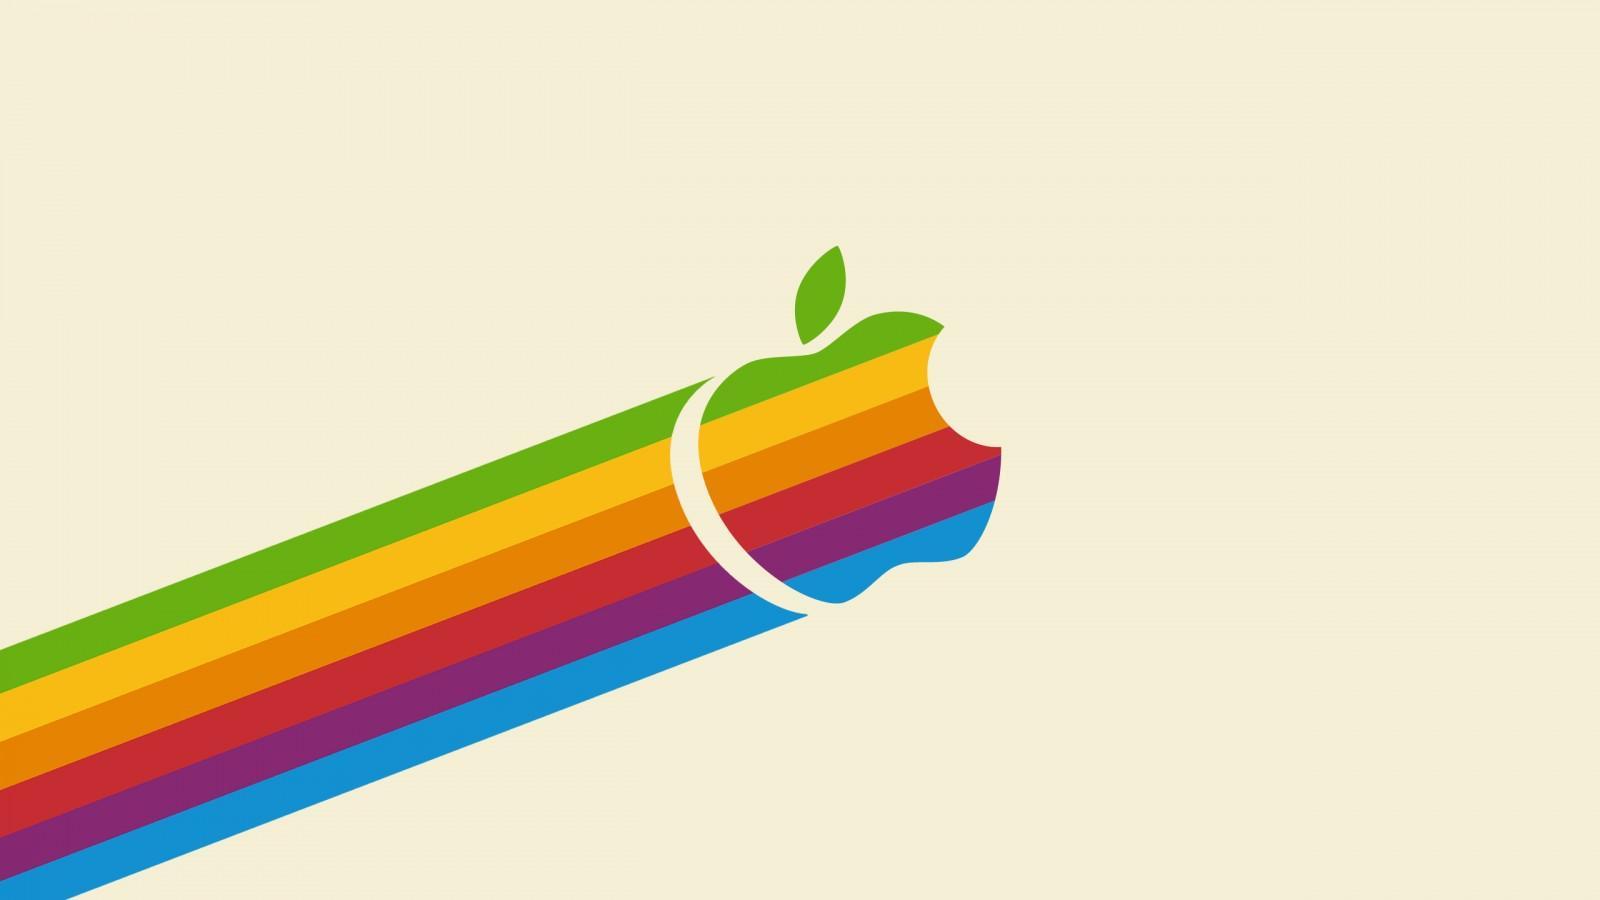 Macintosh Wallpapers 23